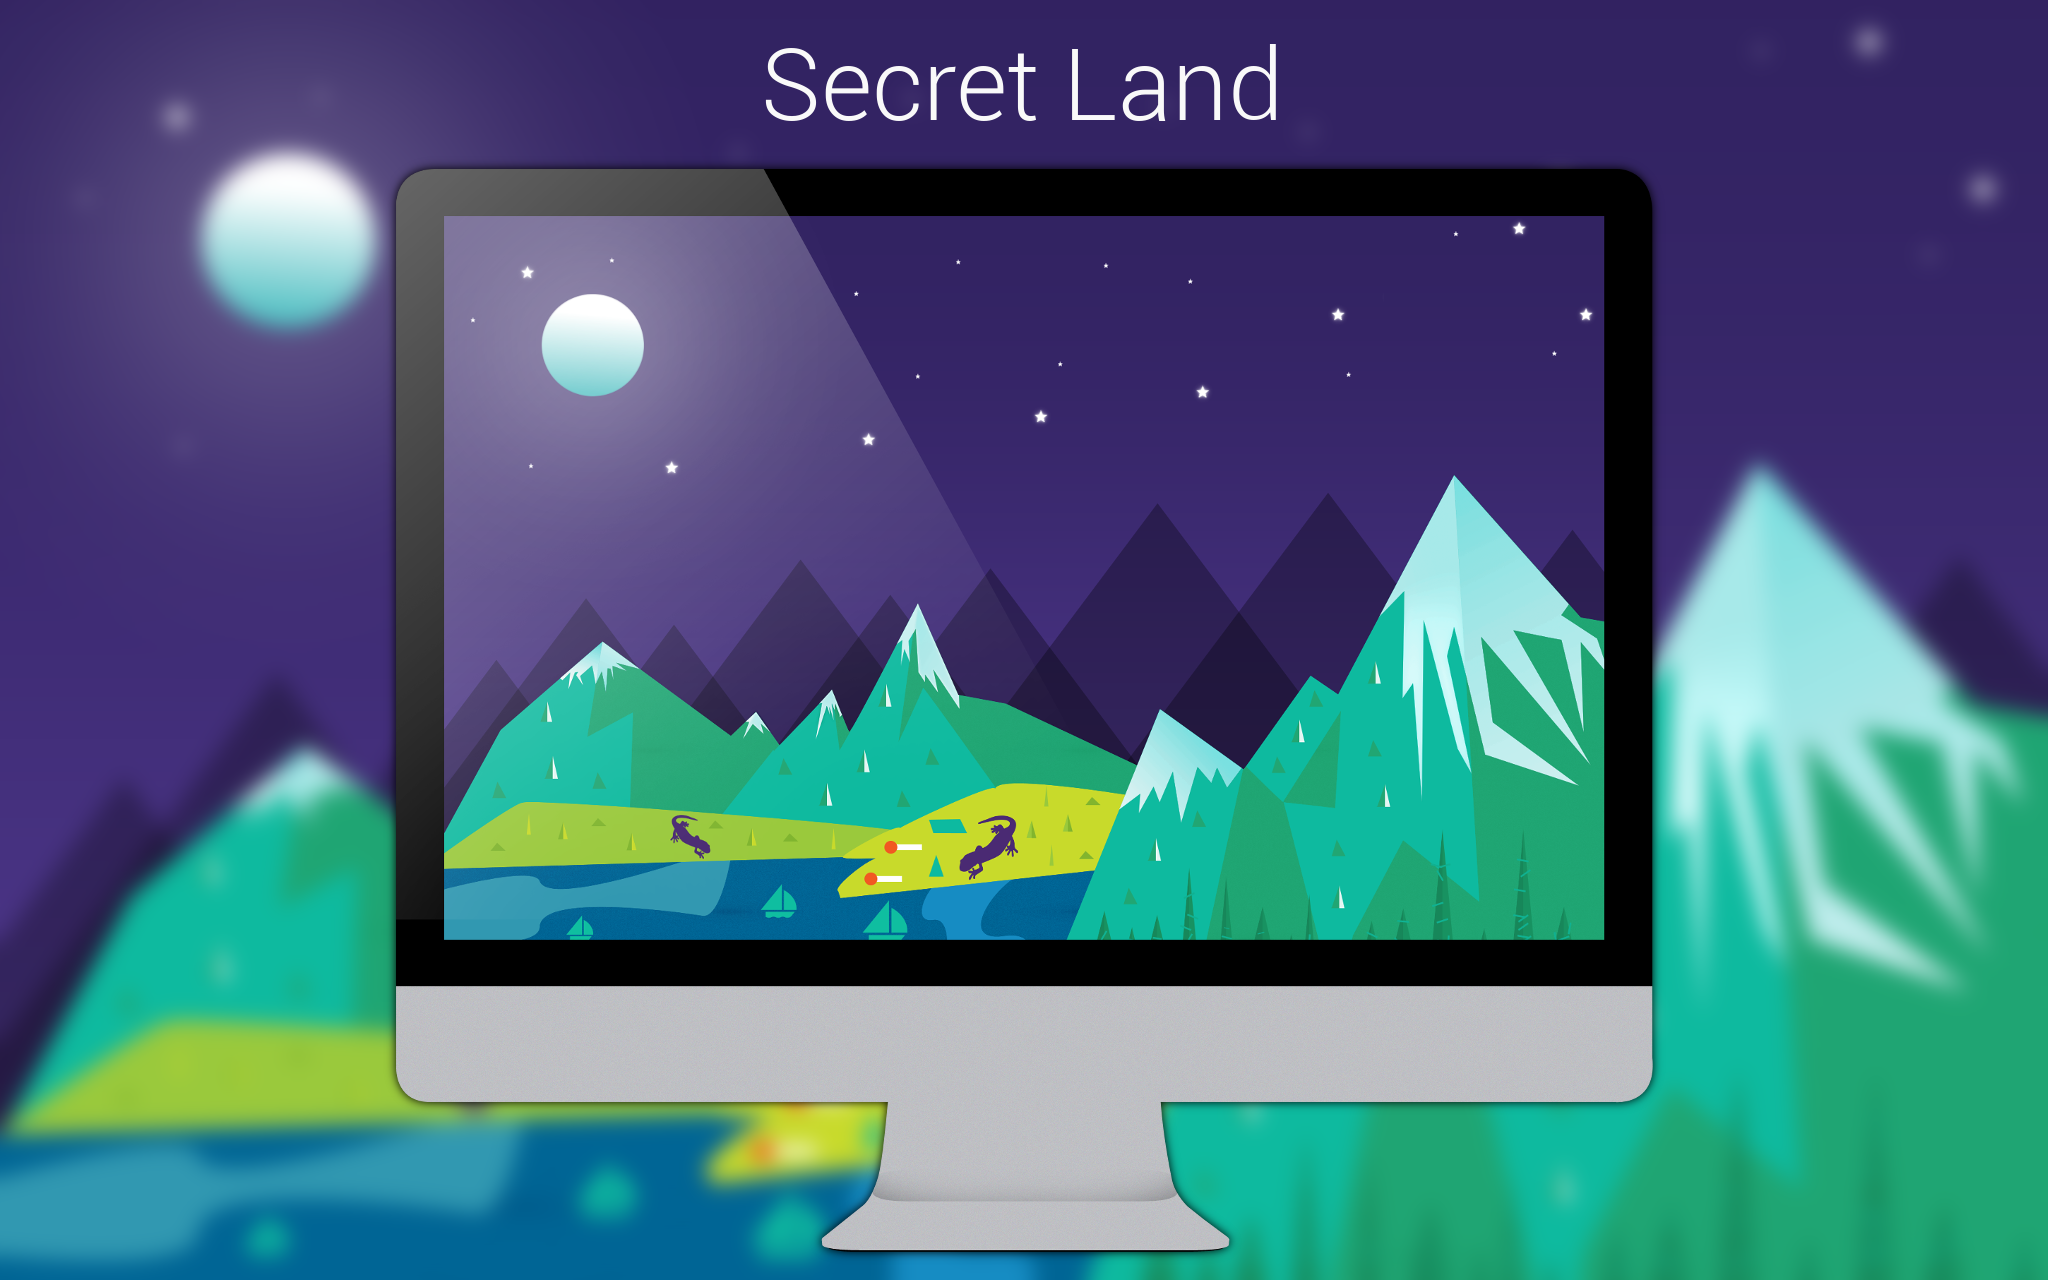 Secret Land Wallpaper